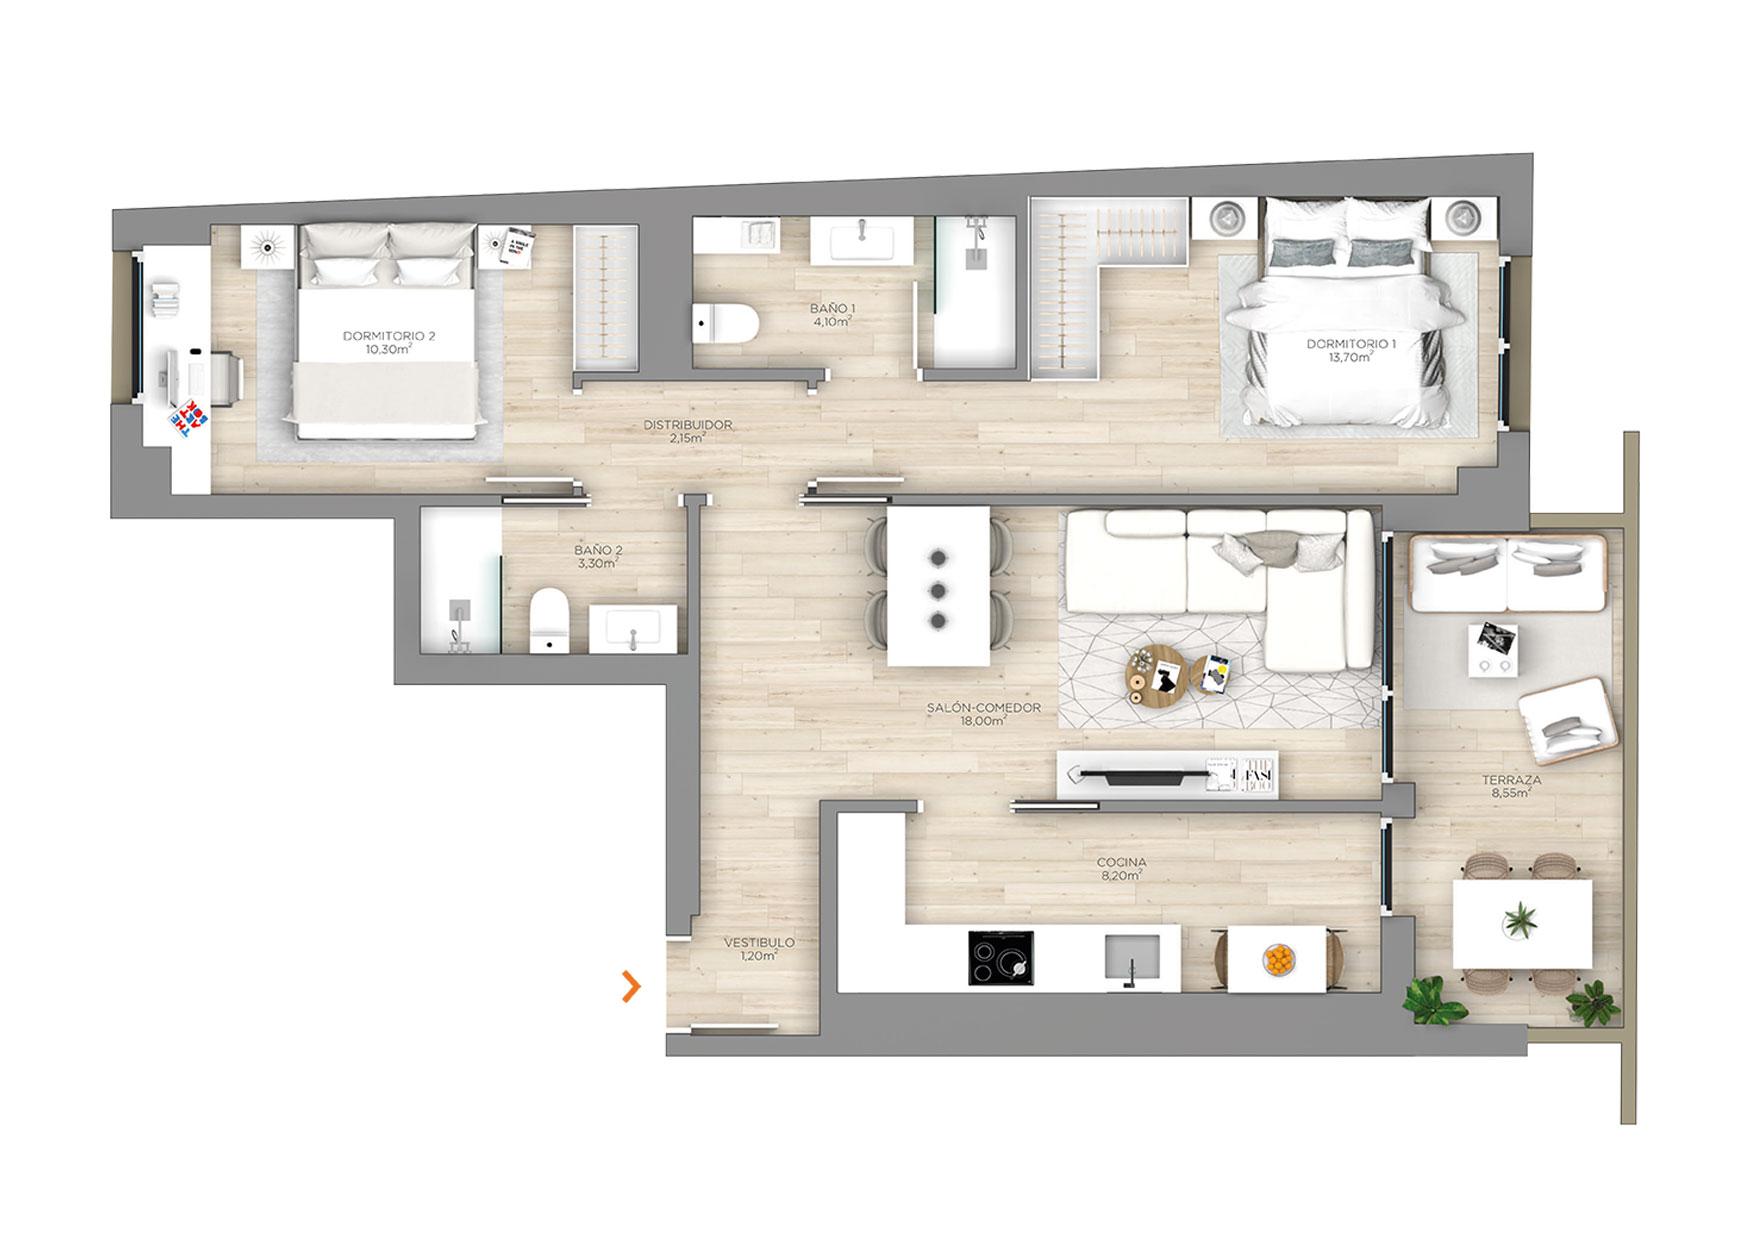 Arrosadia-construcciones-andia_AF_PLANO-PLANTA-1AL6A-1